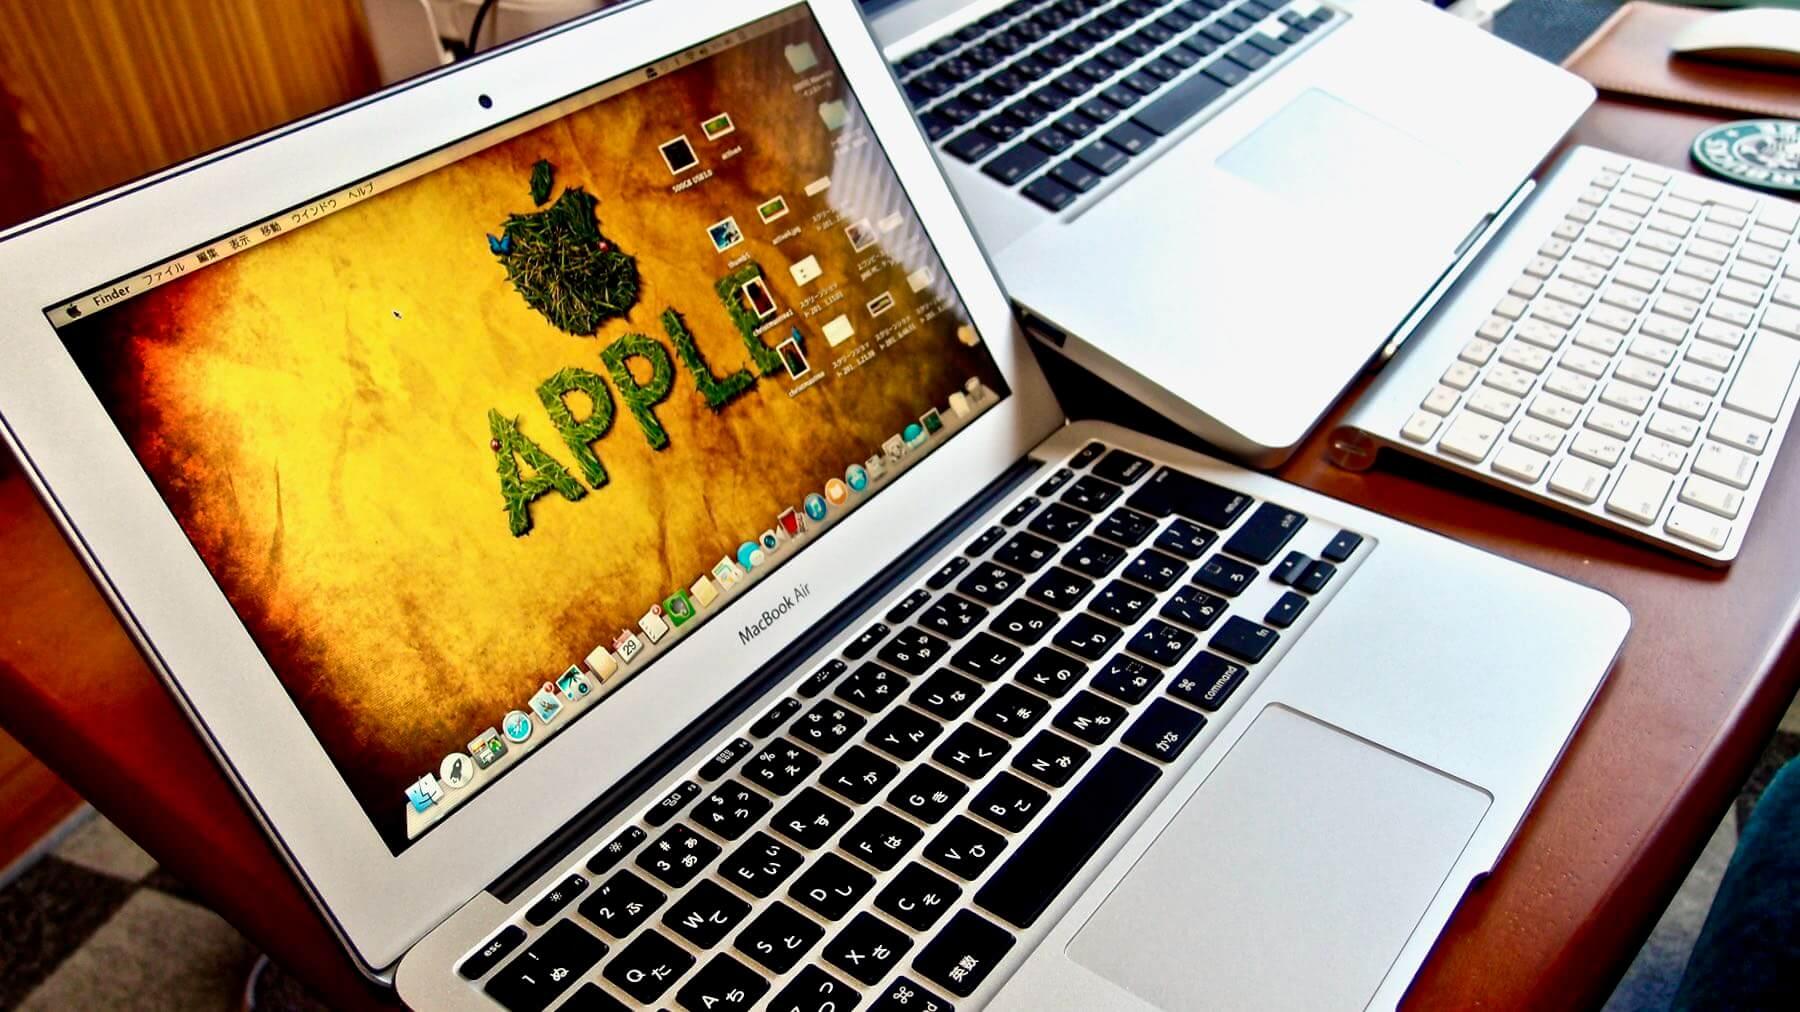 18 MacBook Air2013 Mid 11inch